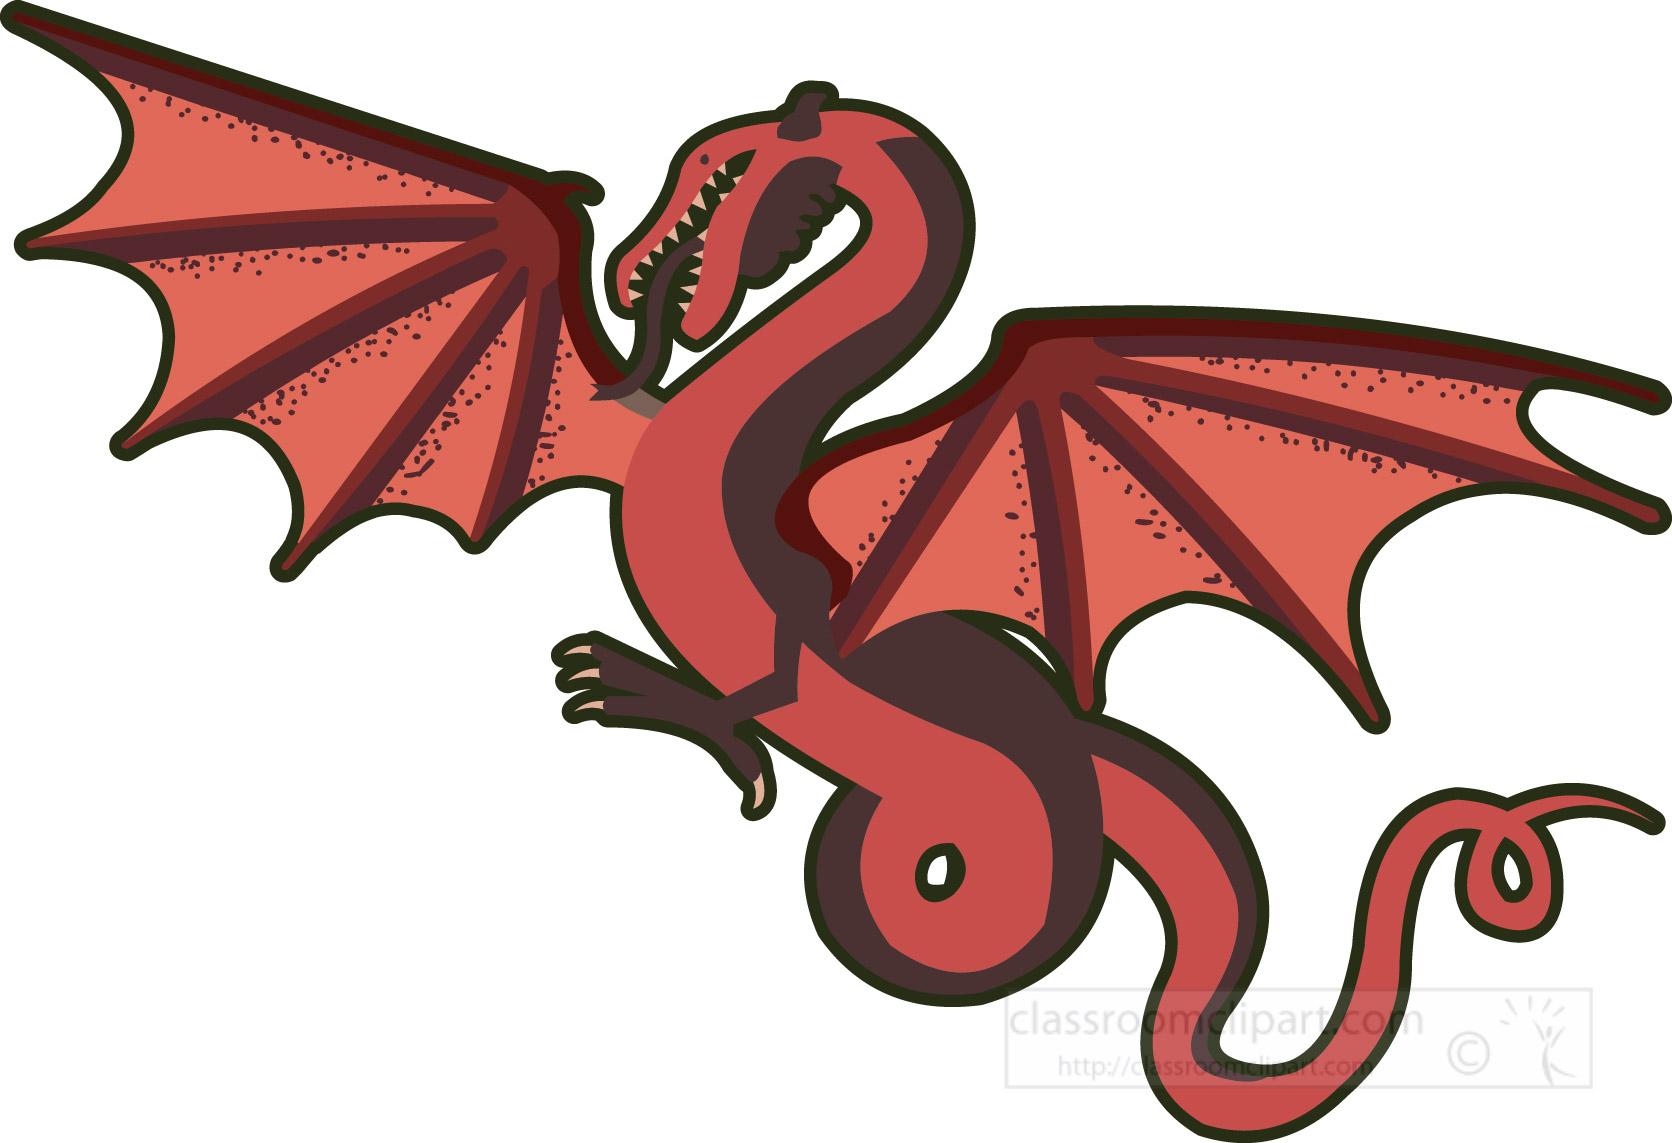 medieval-folklore-mythology-dragon-figure-clipart.jpg